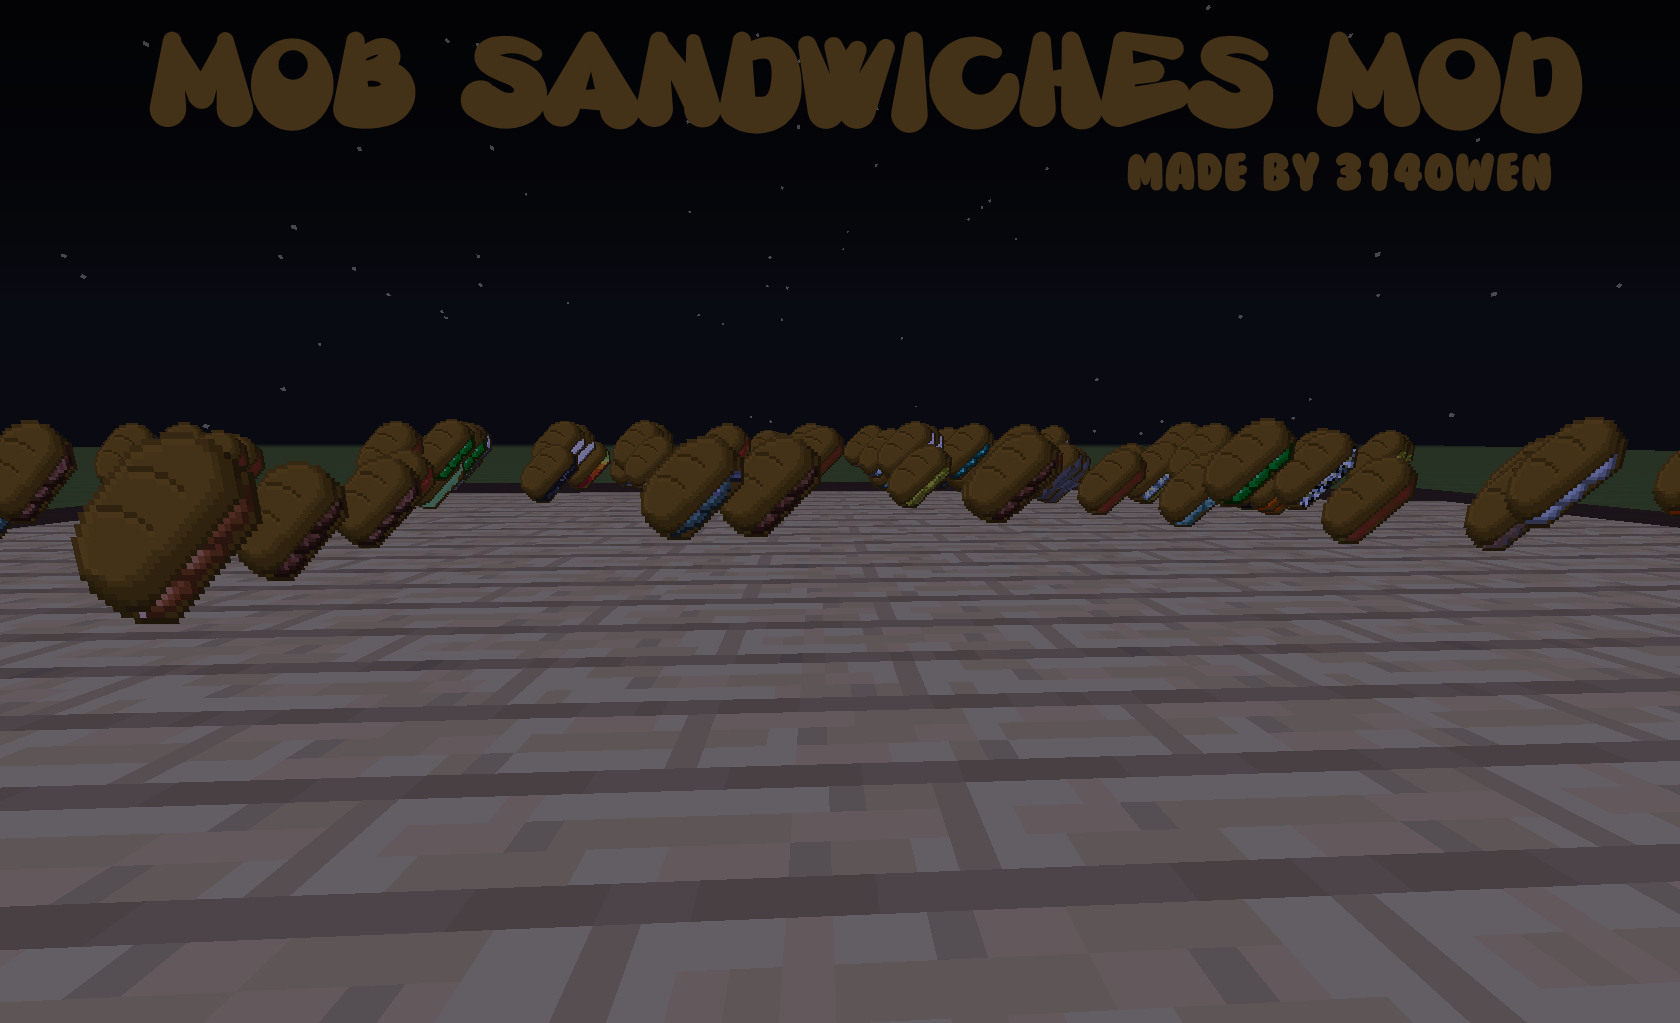 Cd5c8 mob sandwiches mod 1 1 7 10 mob sandwiches mod download